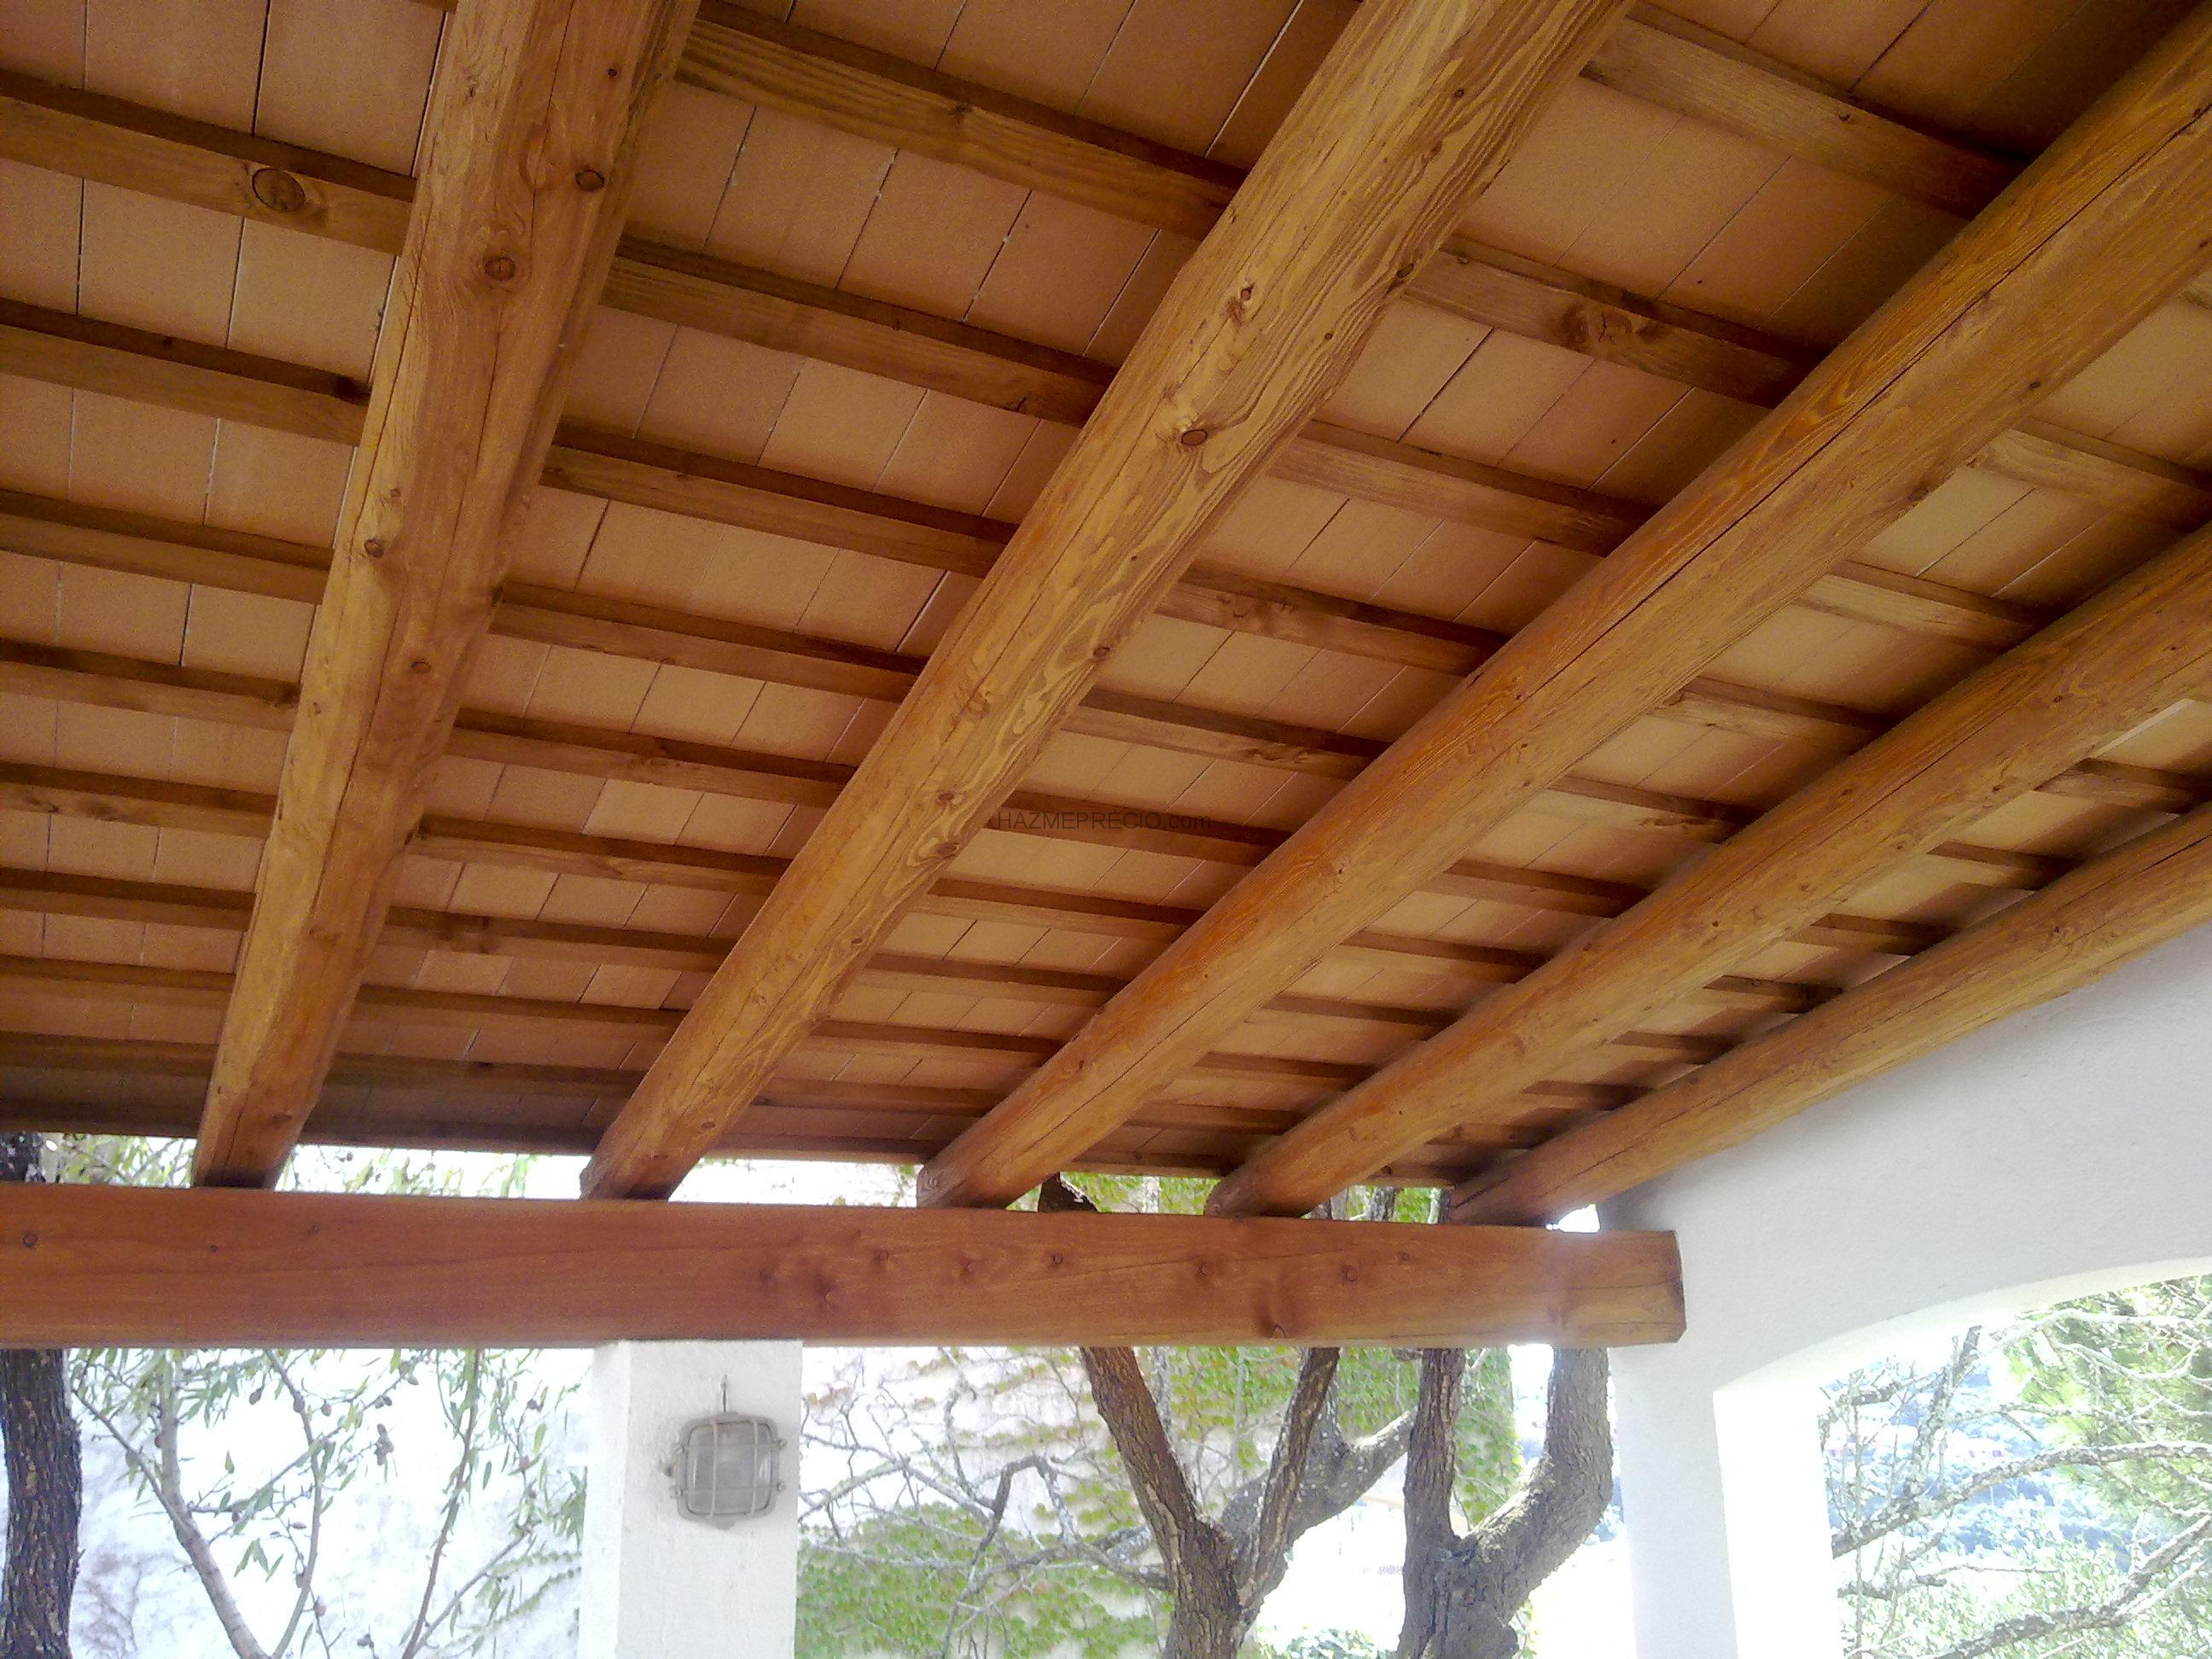 17255 begur girona - Vigas madera techo ...